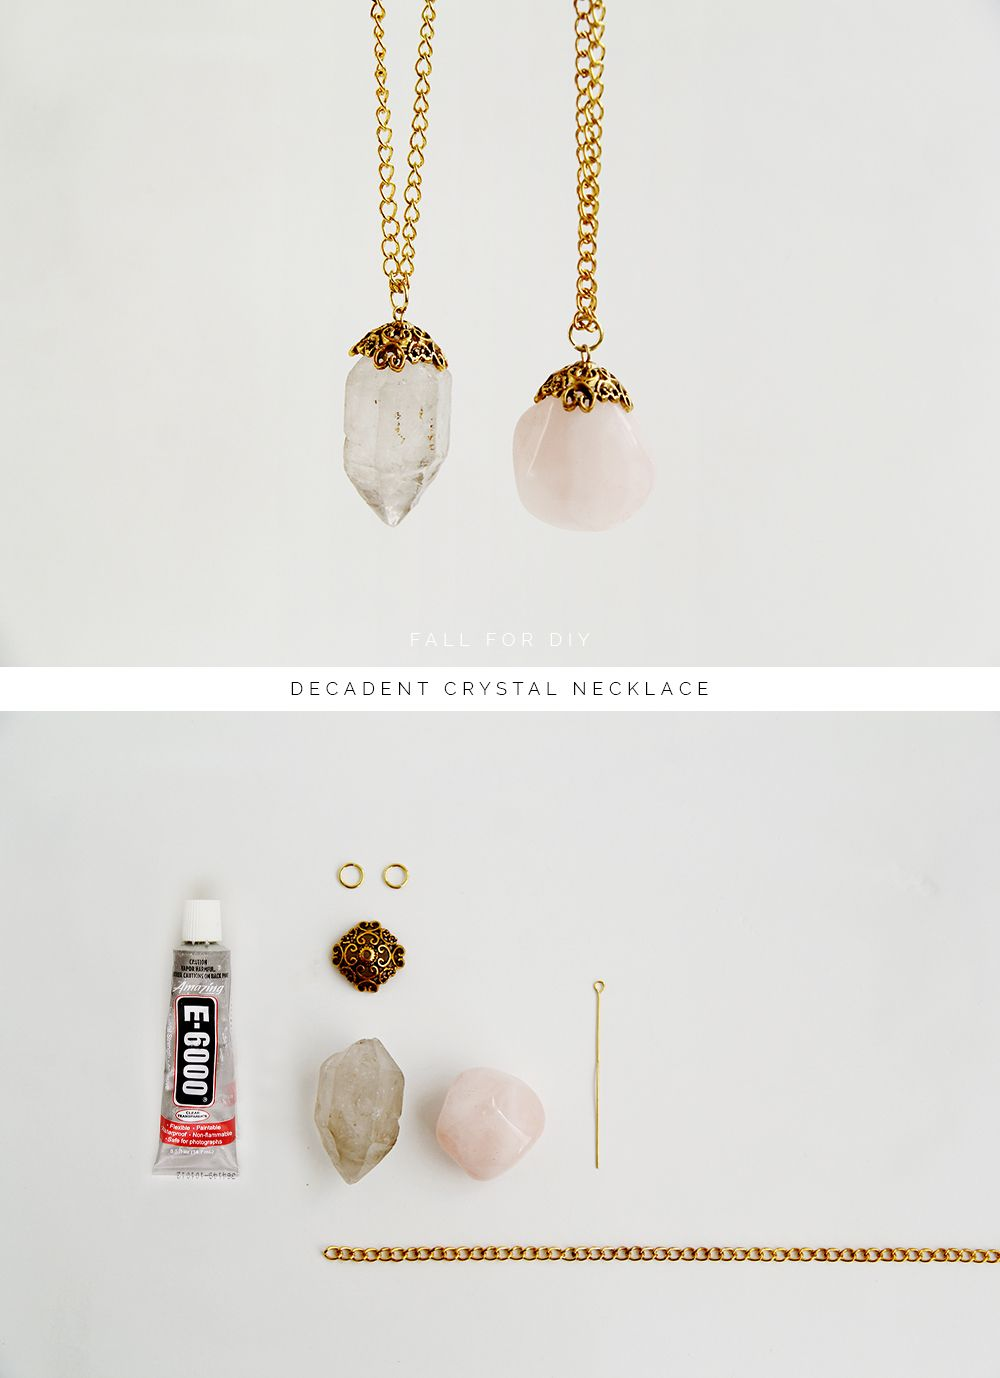 Diy decadent crystal necklace handmade jewelry diy